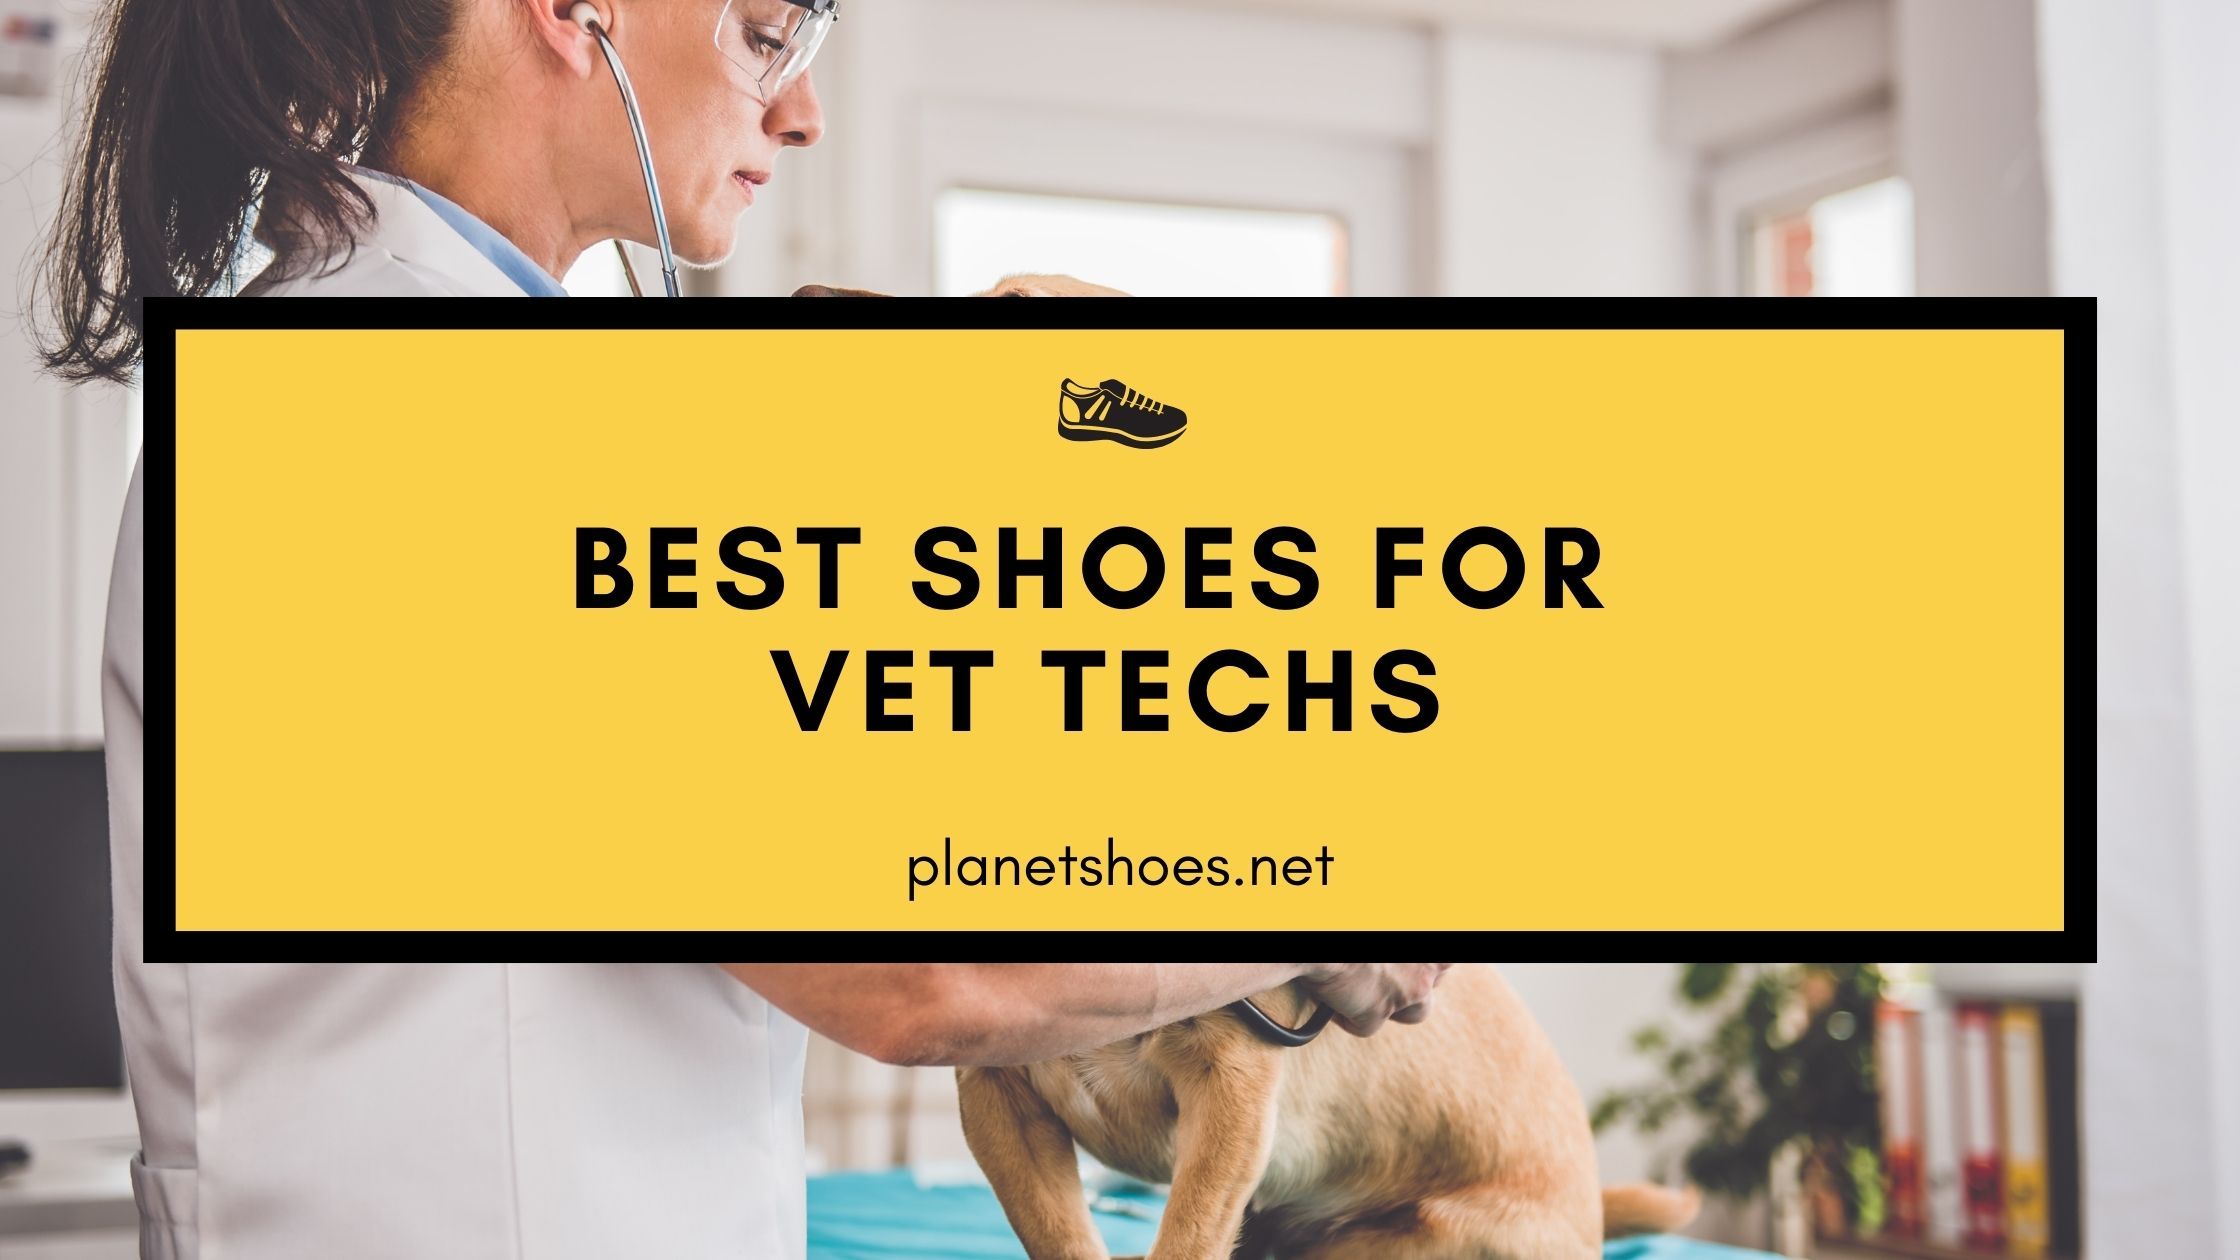 PS-best-shoes-for-vet-techs